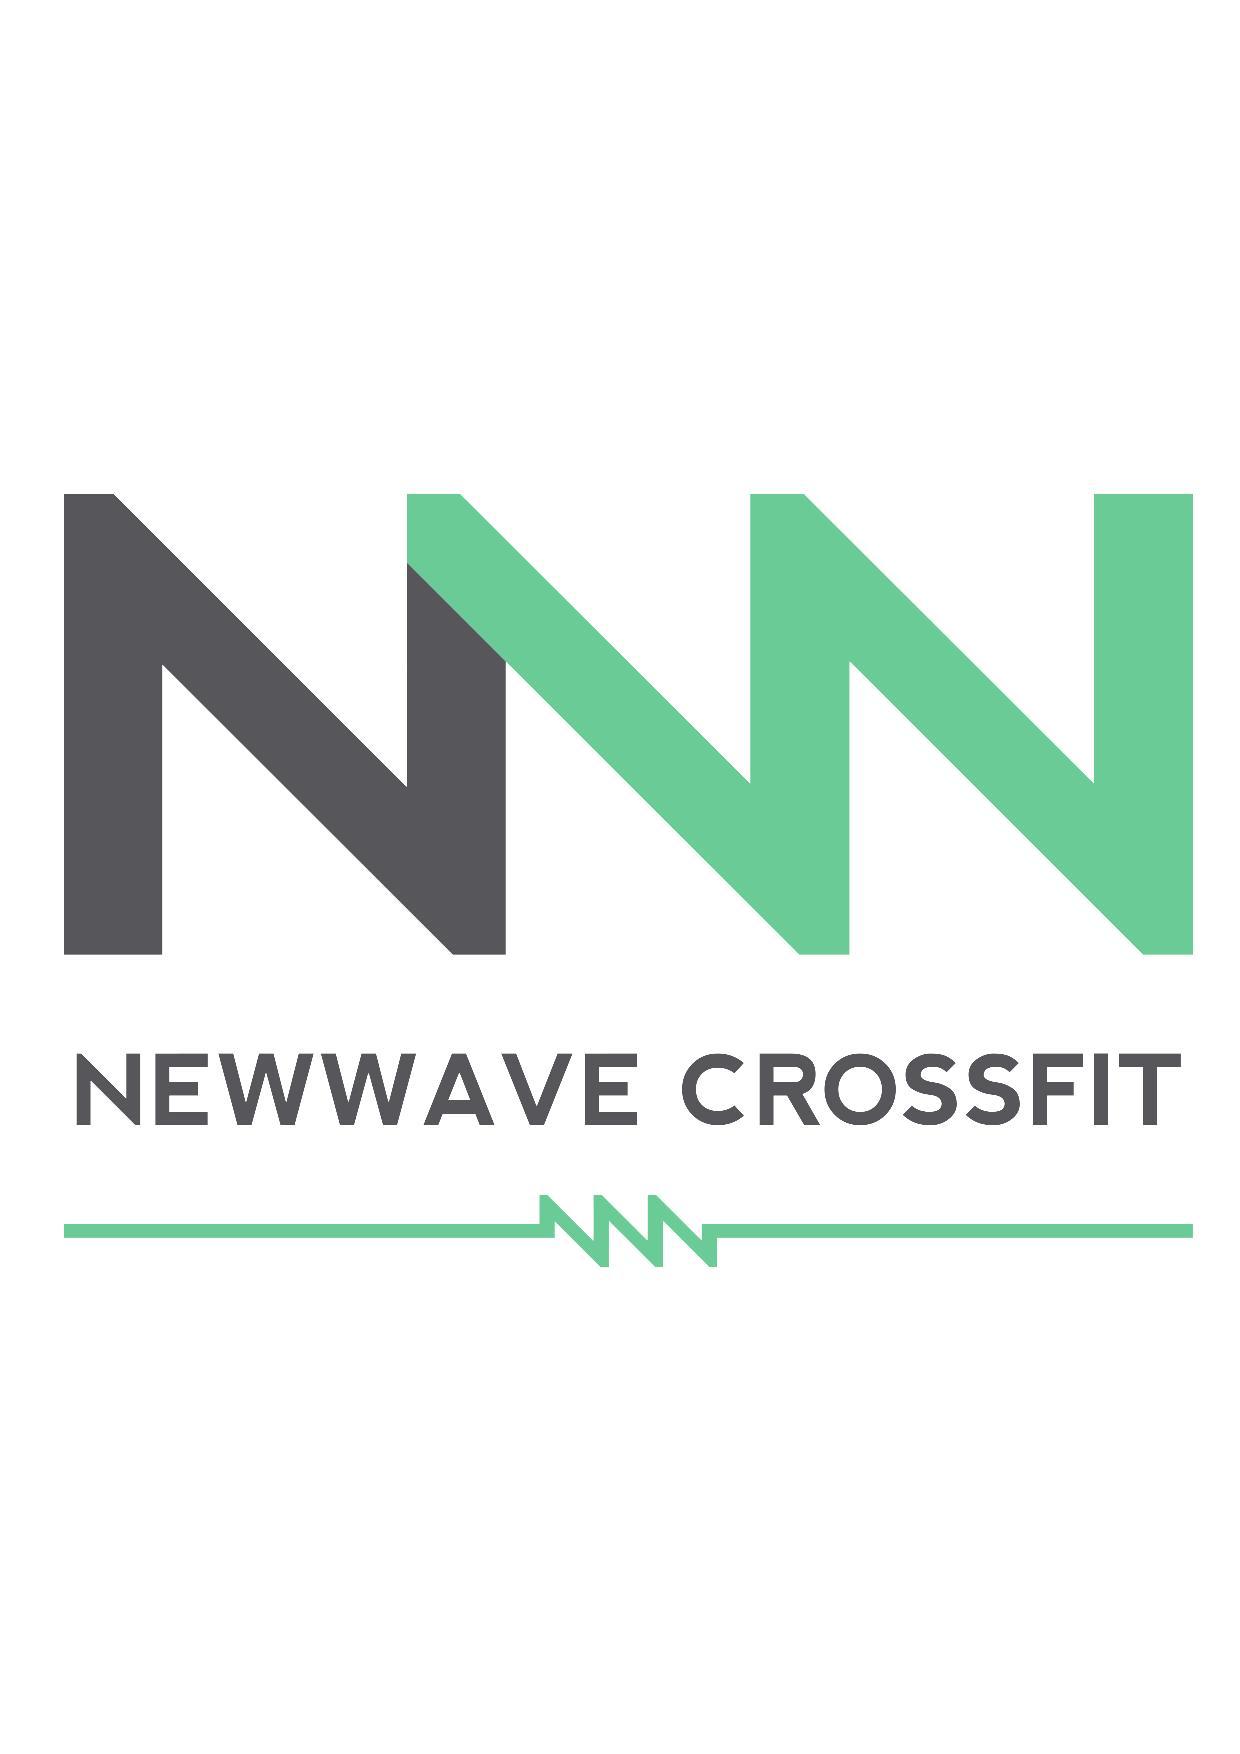 Newwave Crossfit